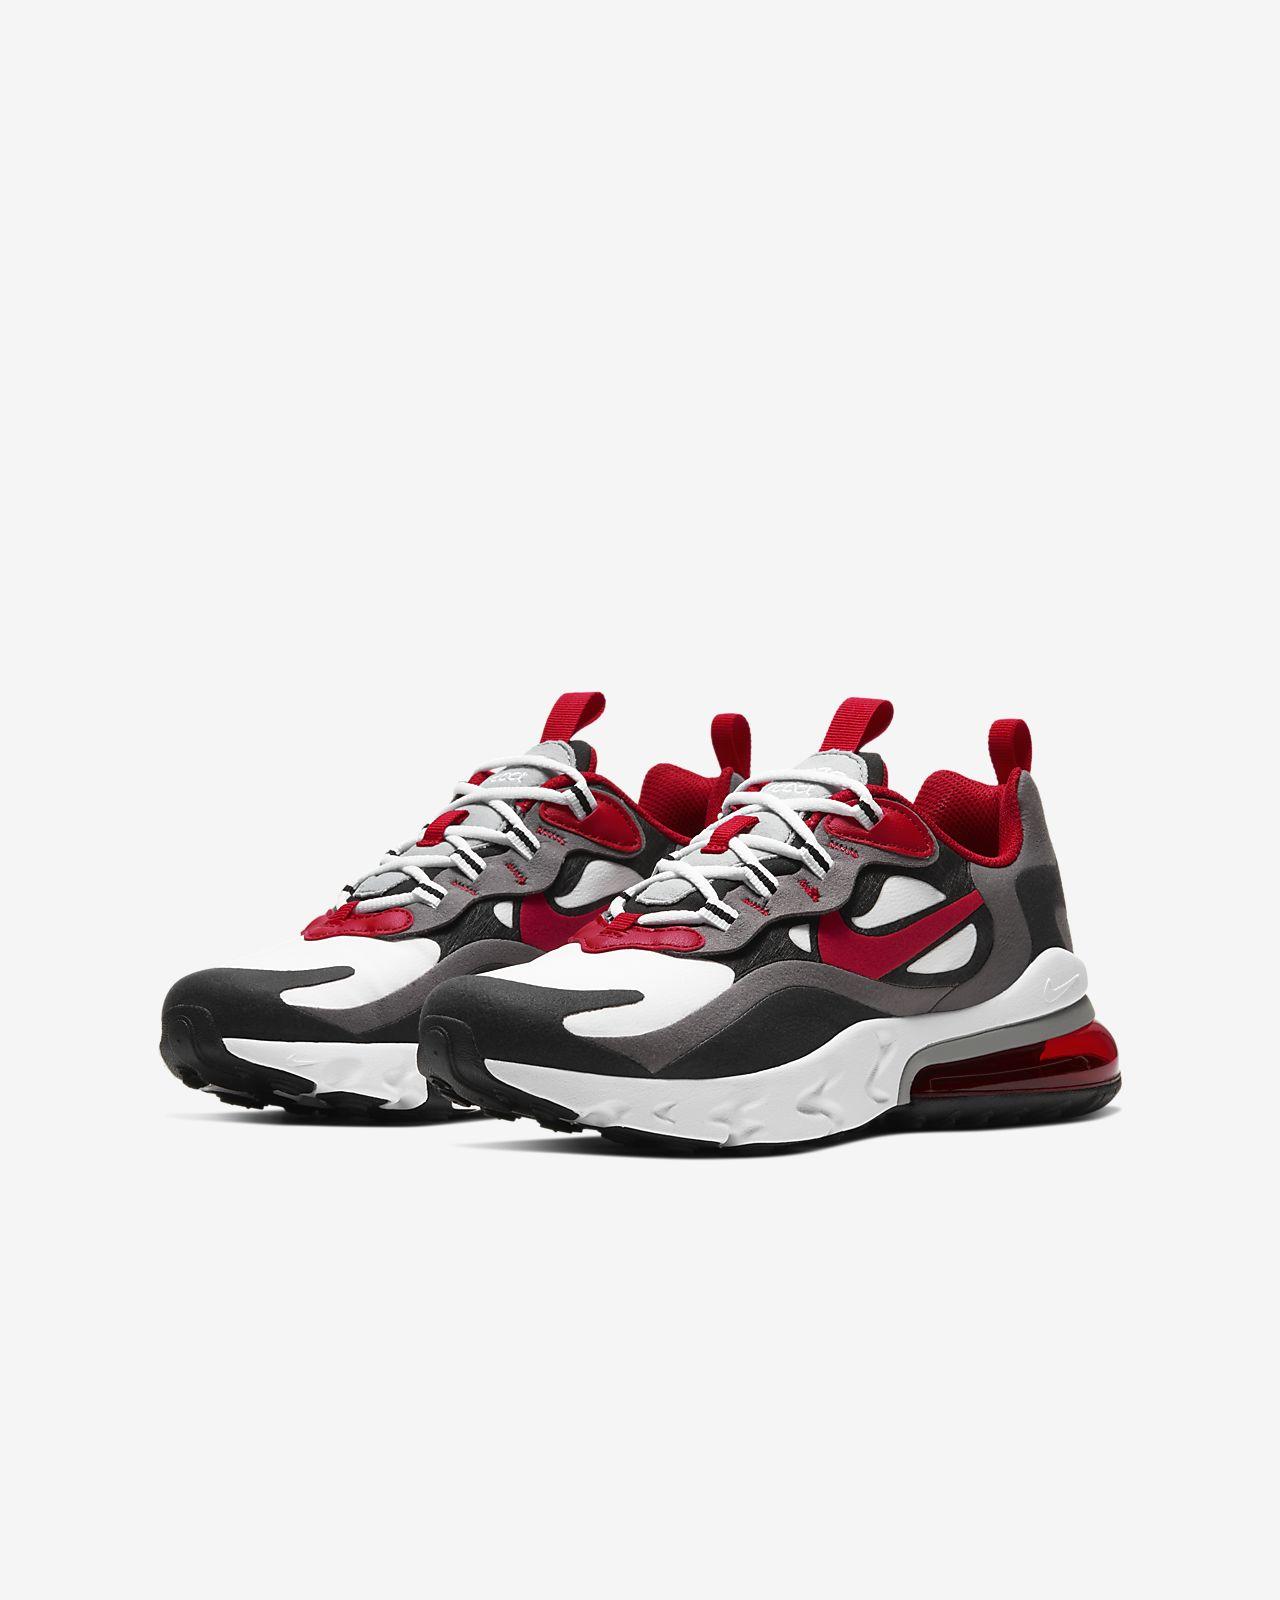 nike air max 270 white running shoes